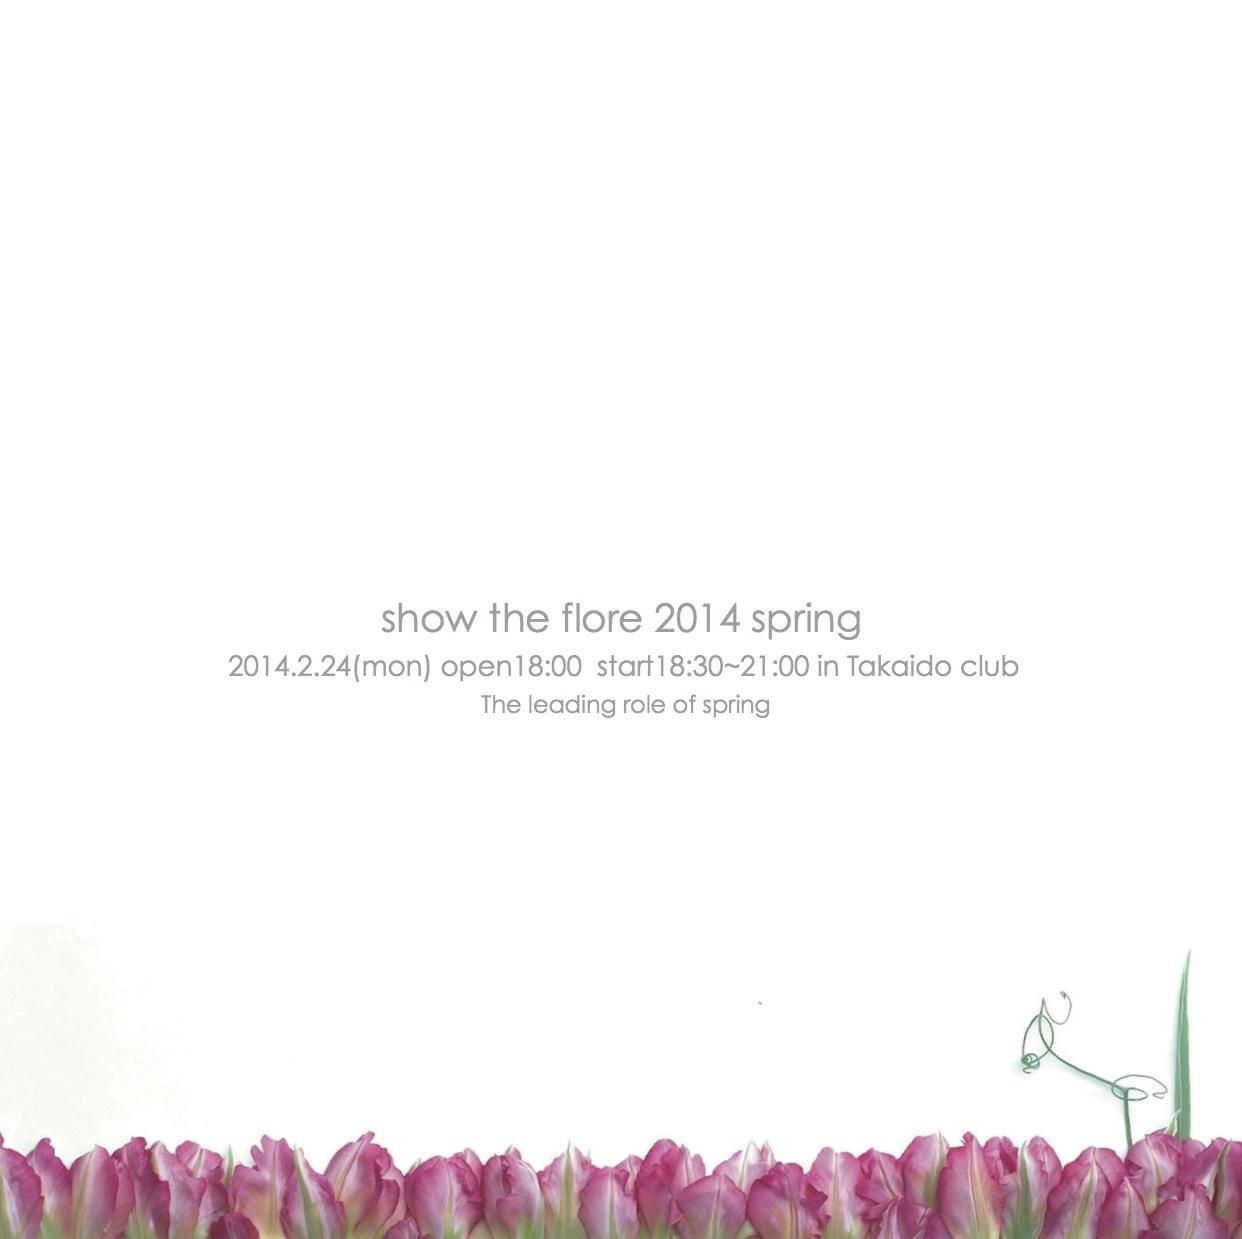 http://flore21.com/contents/show/stf_224_h.p.jpg